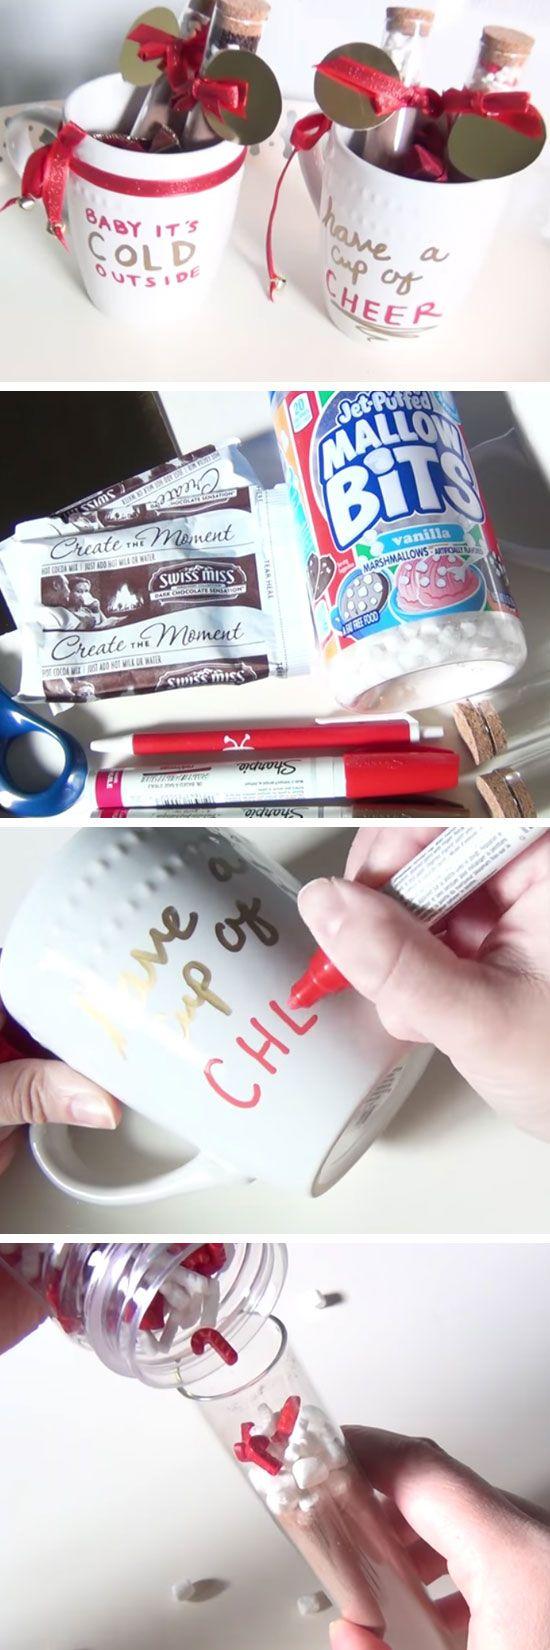 15 Awesome Christmas Gift Ideas for Mom | Christmas Decor ...